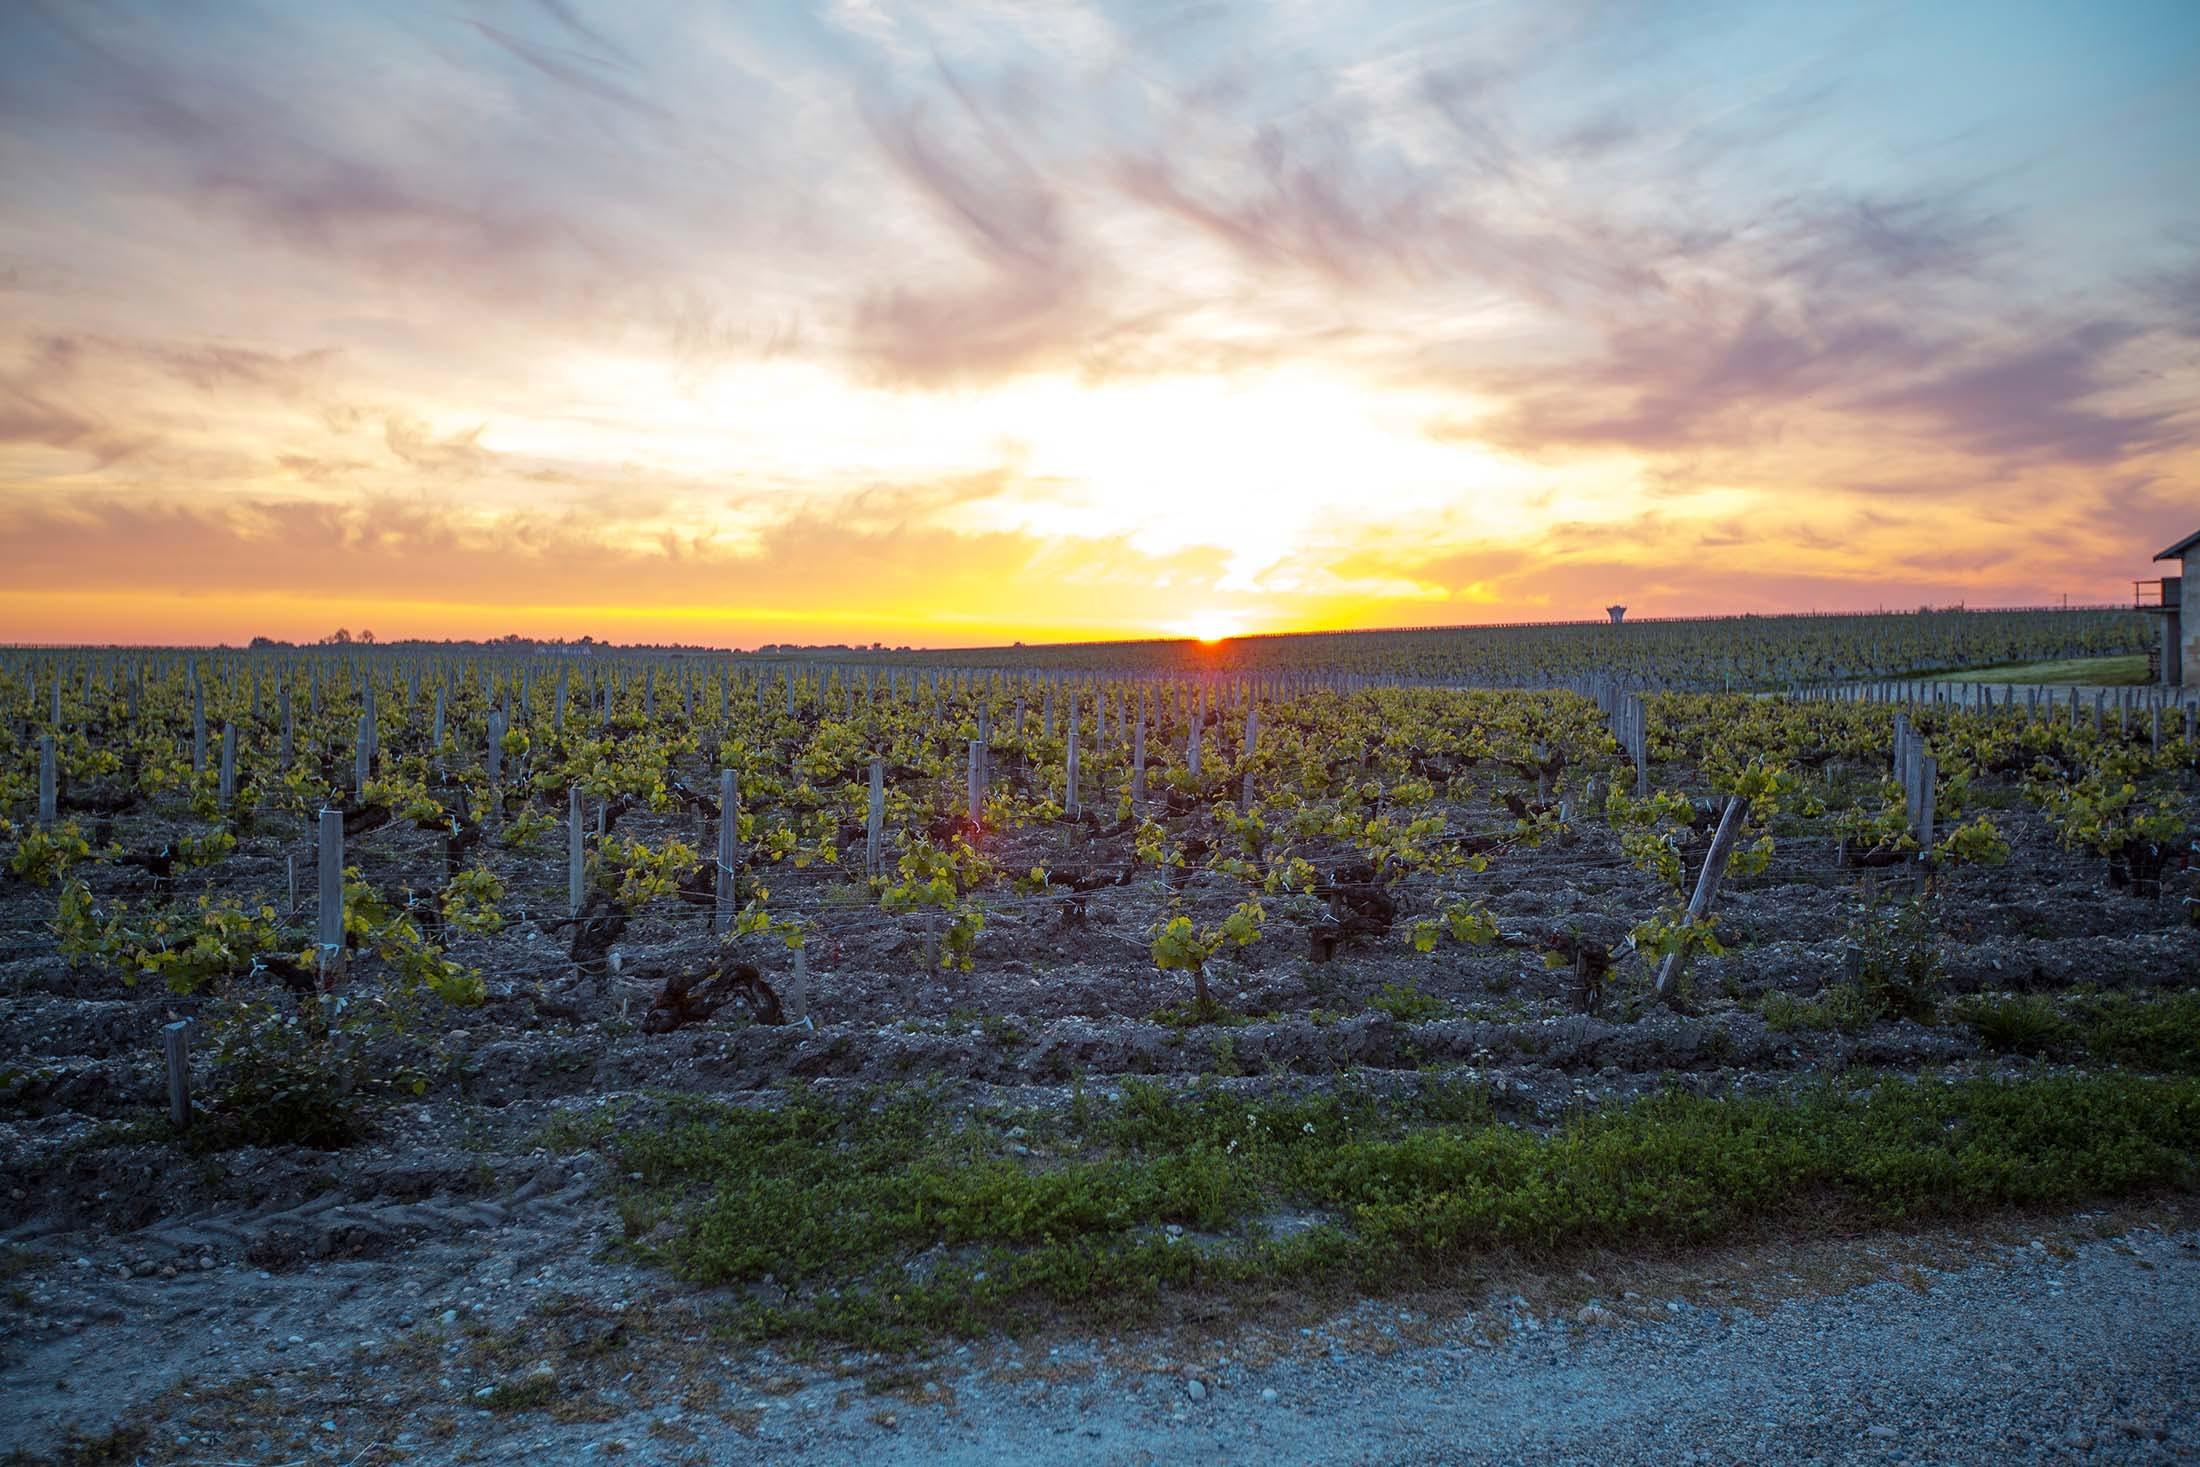 Vineyards in Bordeaux, France